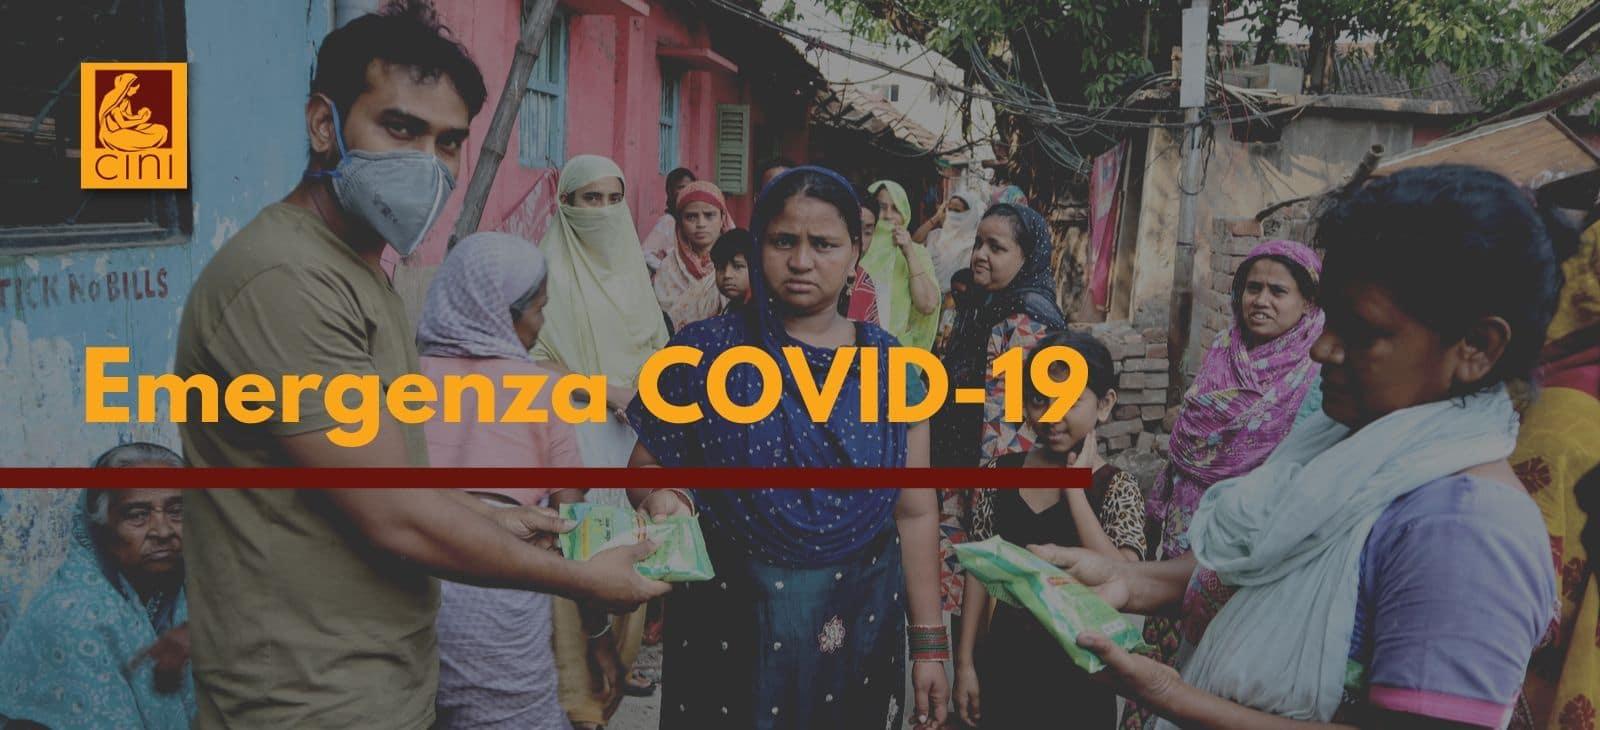 cini emergenza covid india